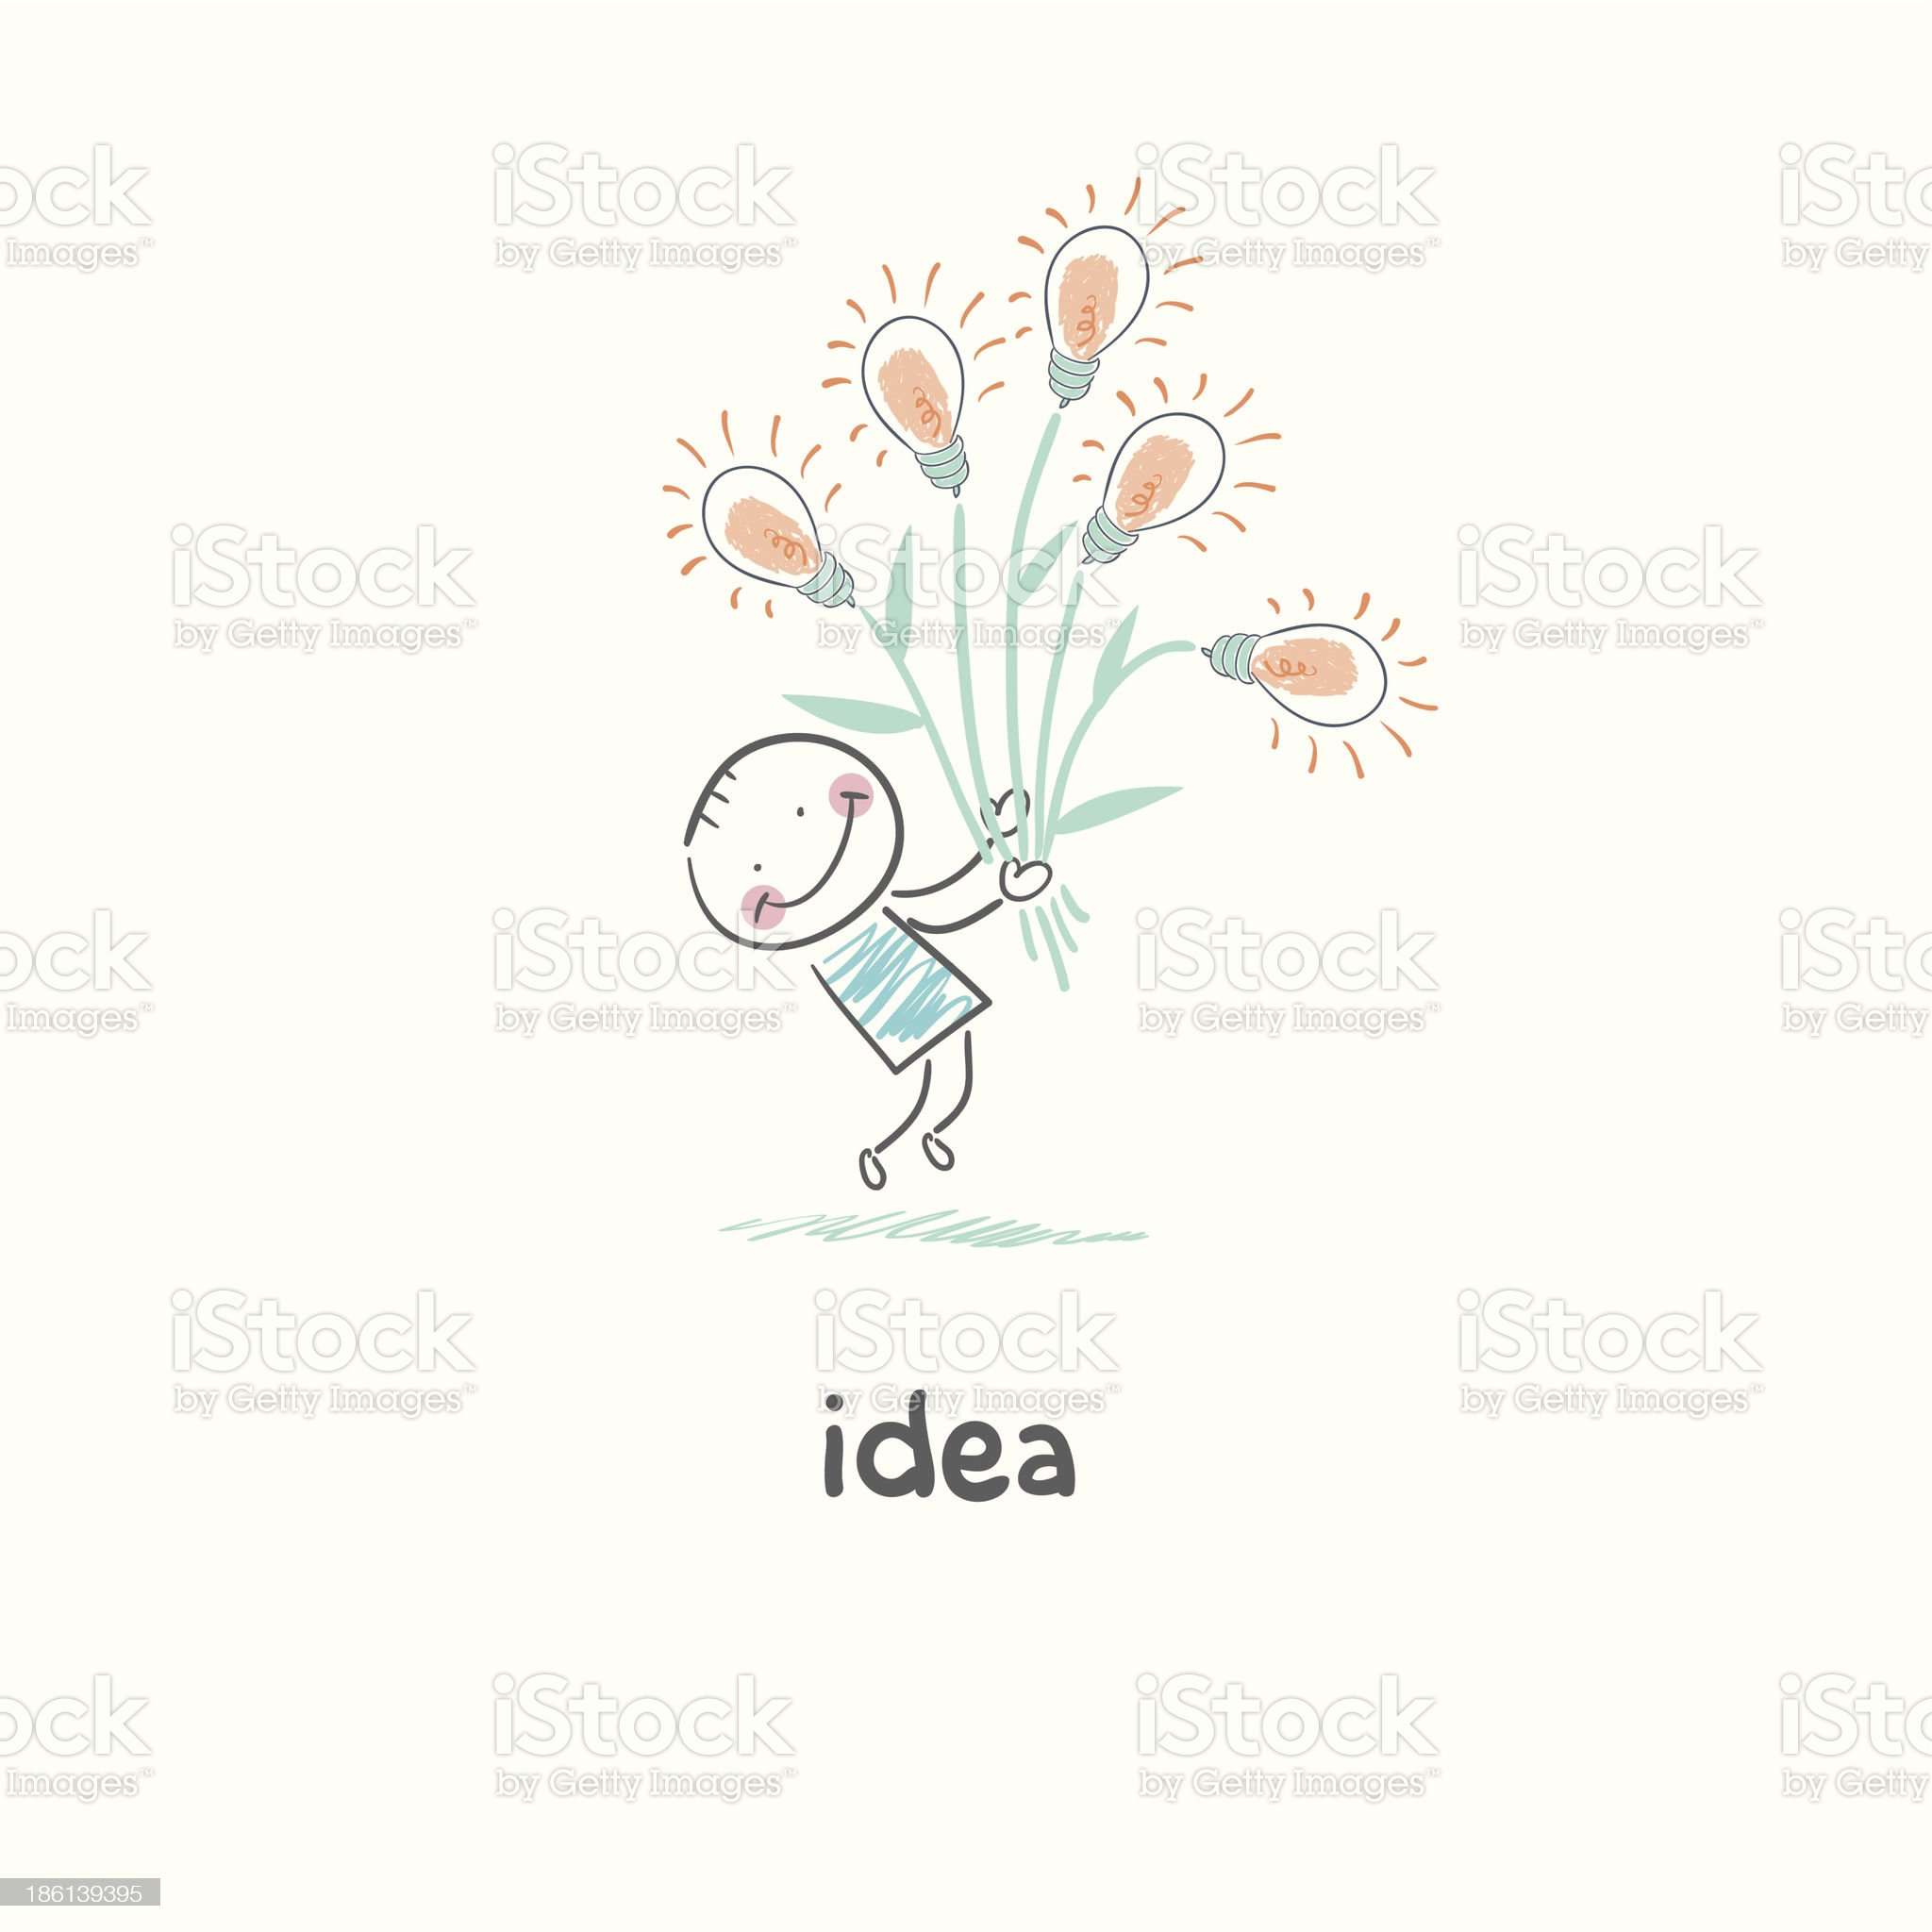 man holding a bouquet of light bulbs. Concept ideas. royalty-free stock vector art